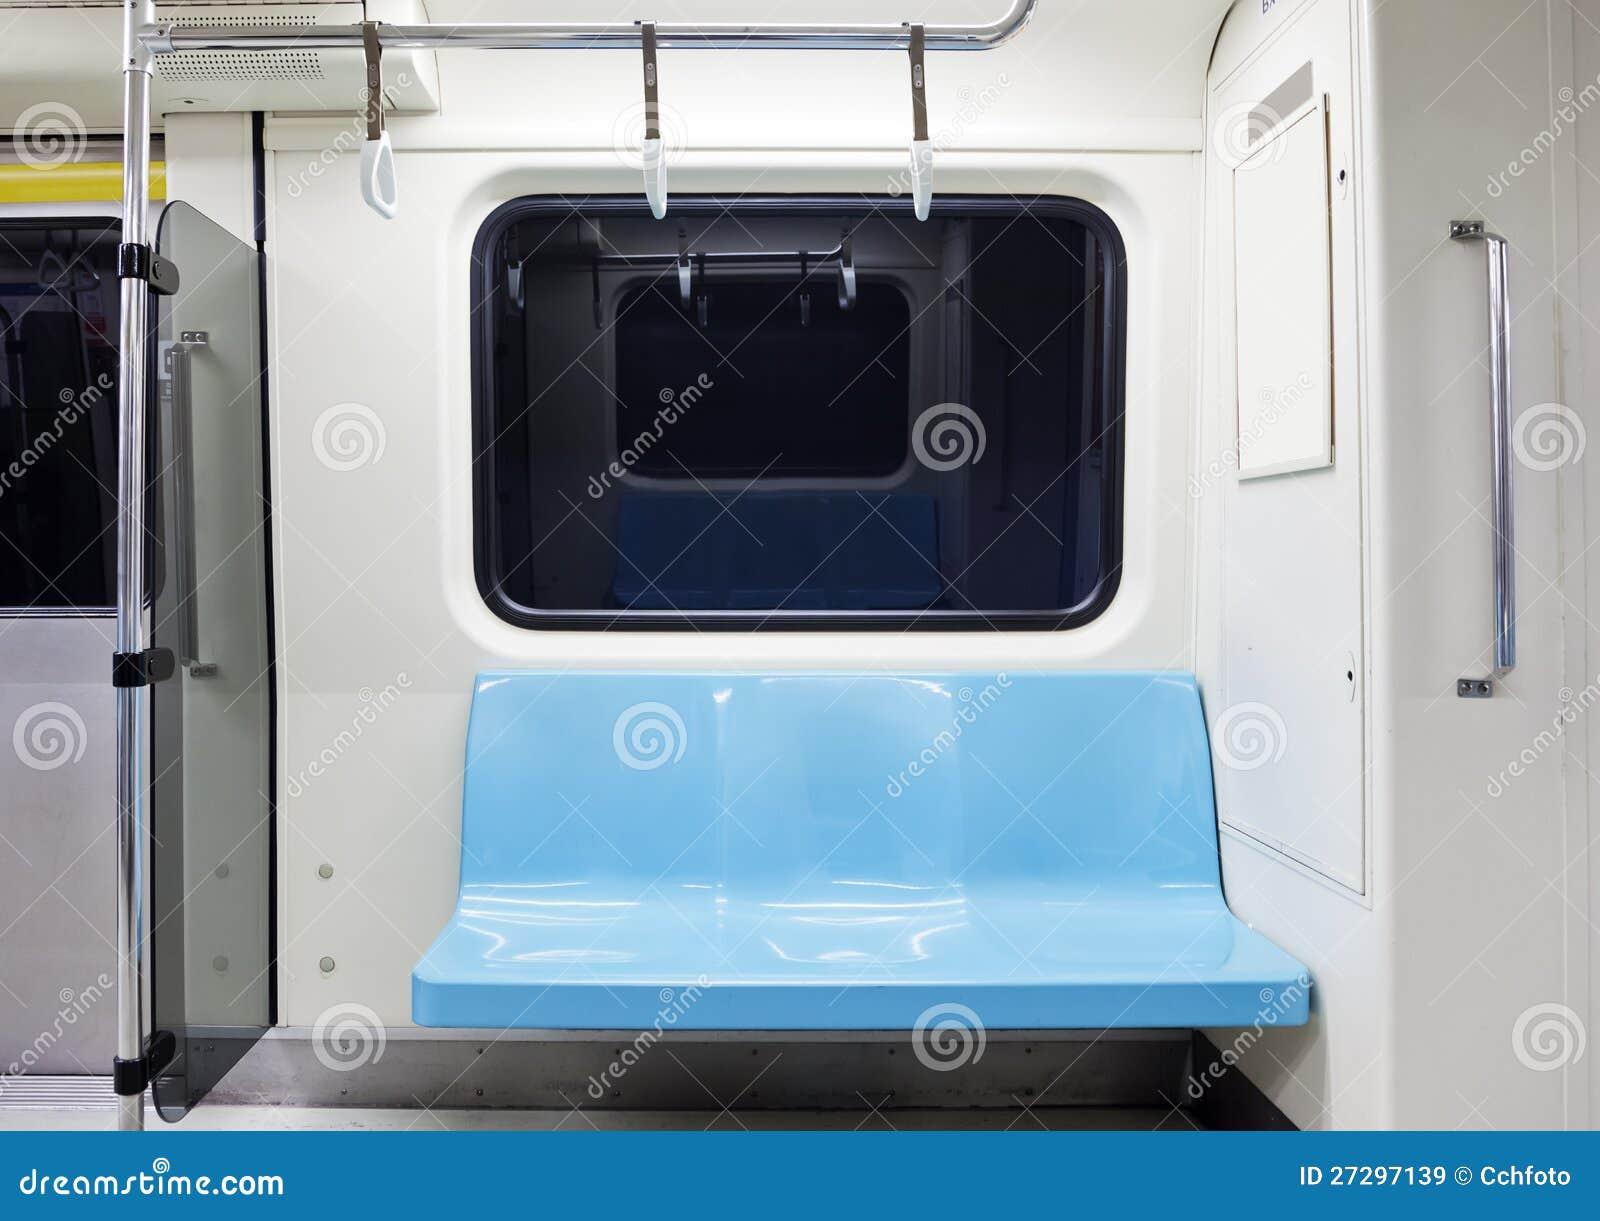 Subway Train Empty Seat Stock Image Image Of Grass Seat